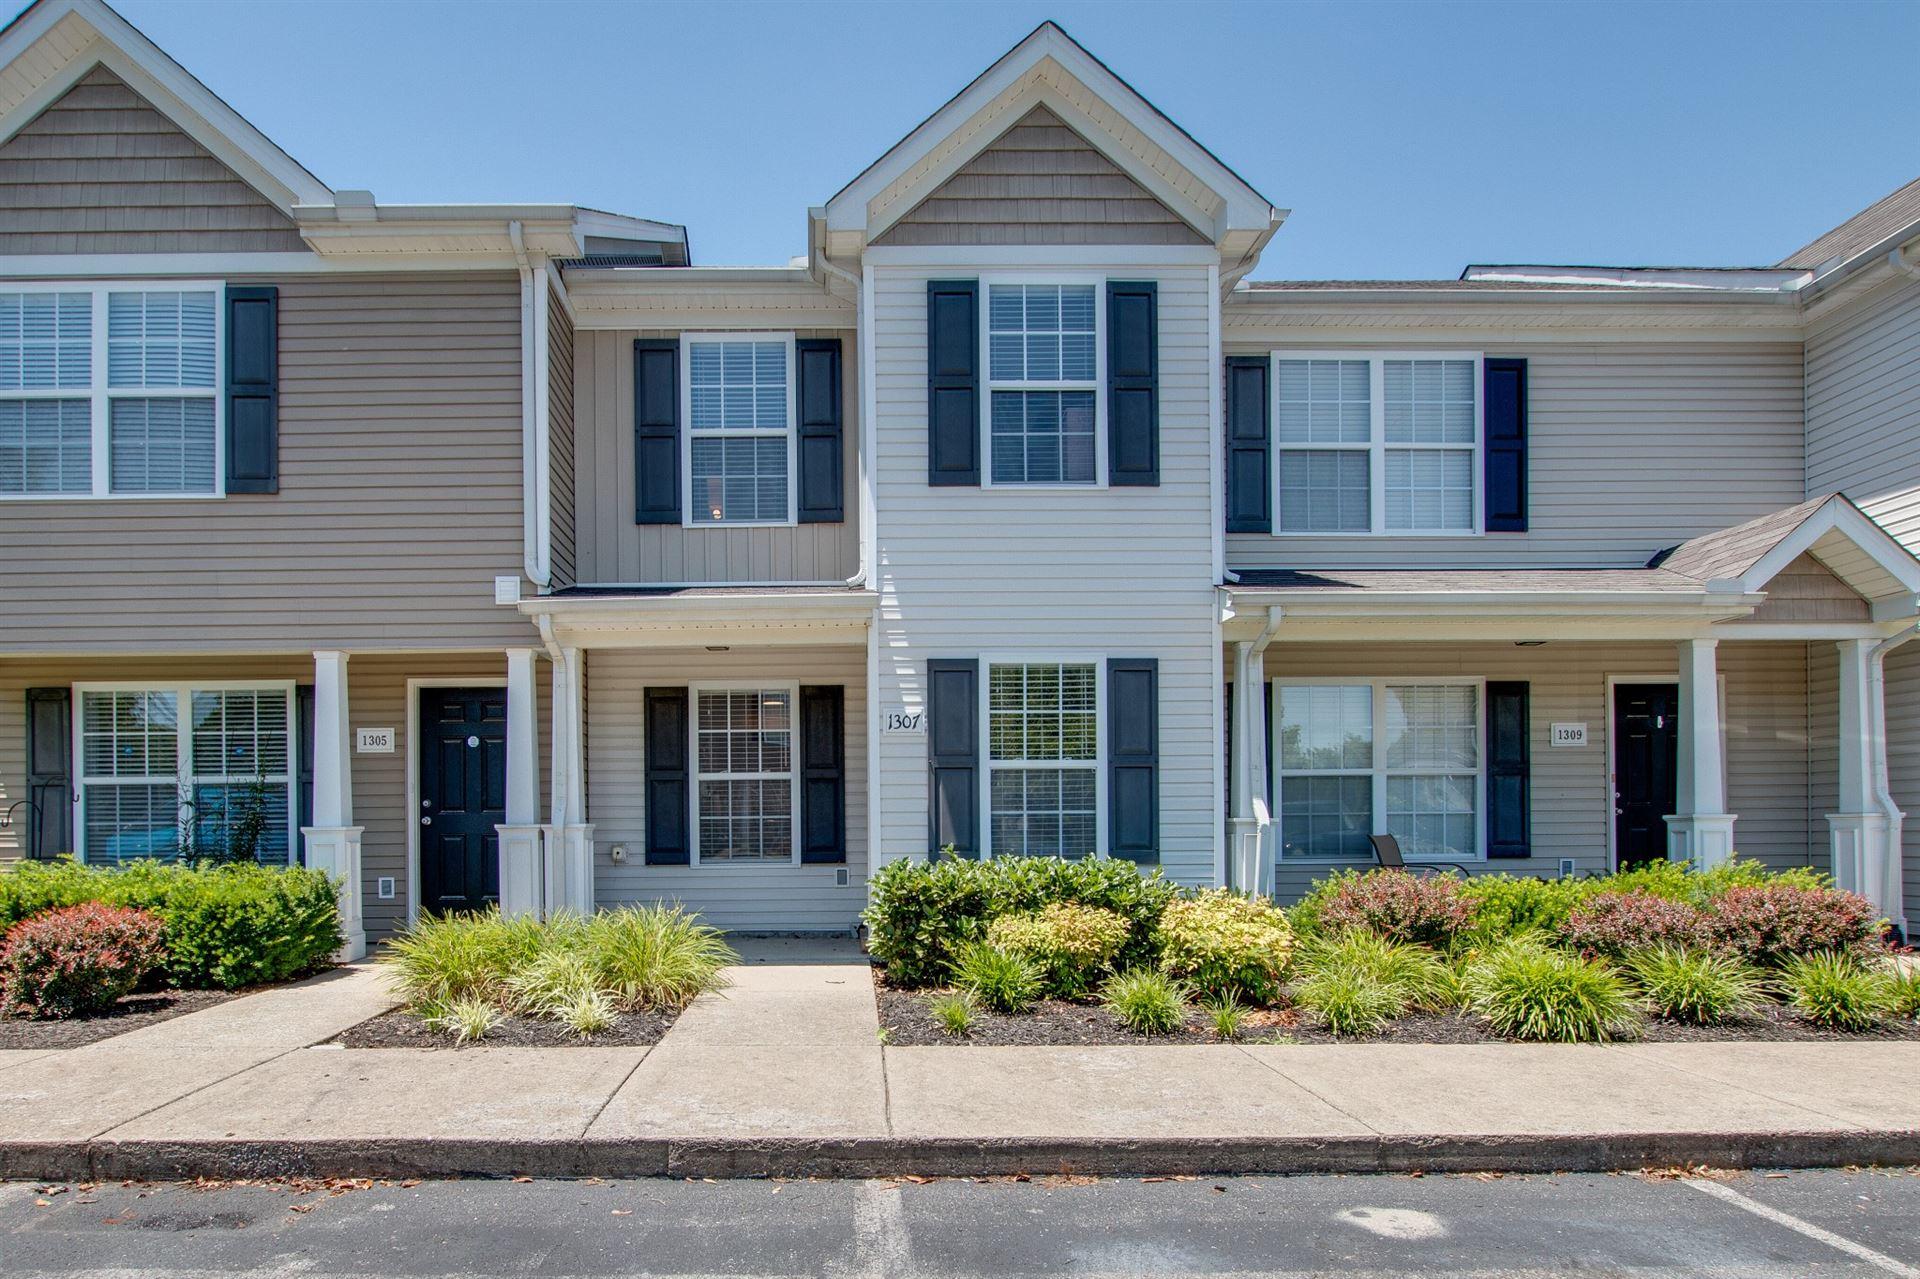 1307 Amsterdam Ct, Murfreesboro, TN 37130 - MLS#: 2264298